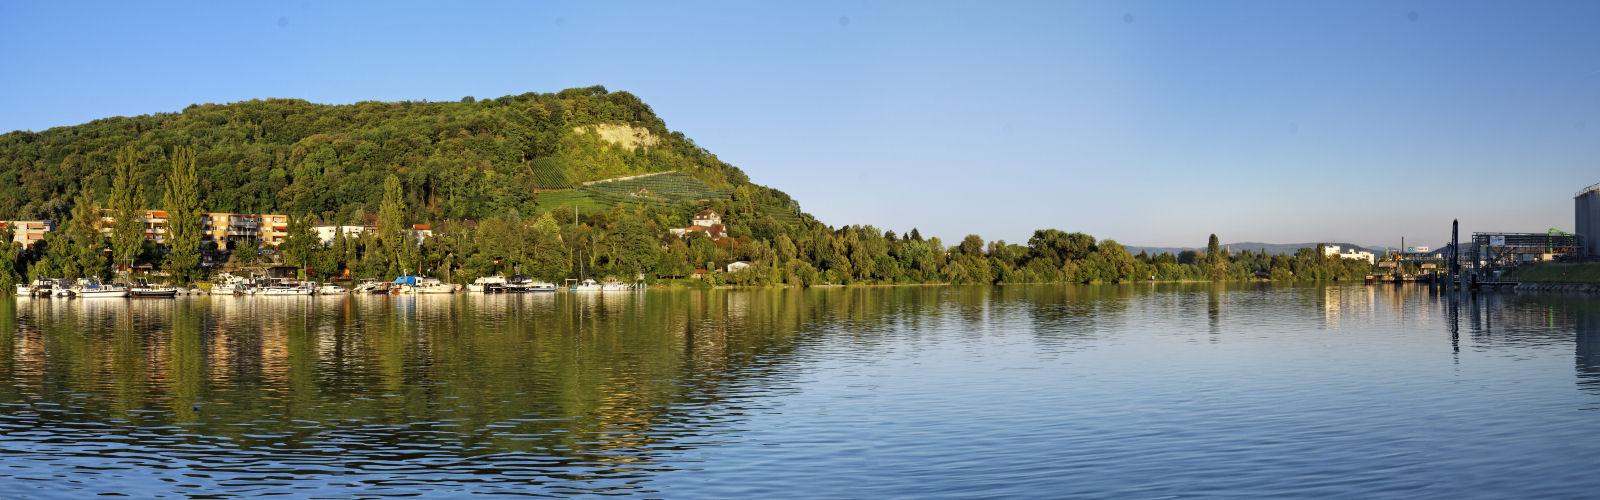 Hornfelsen, Grenzach-Wyhlen